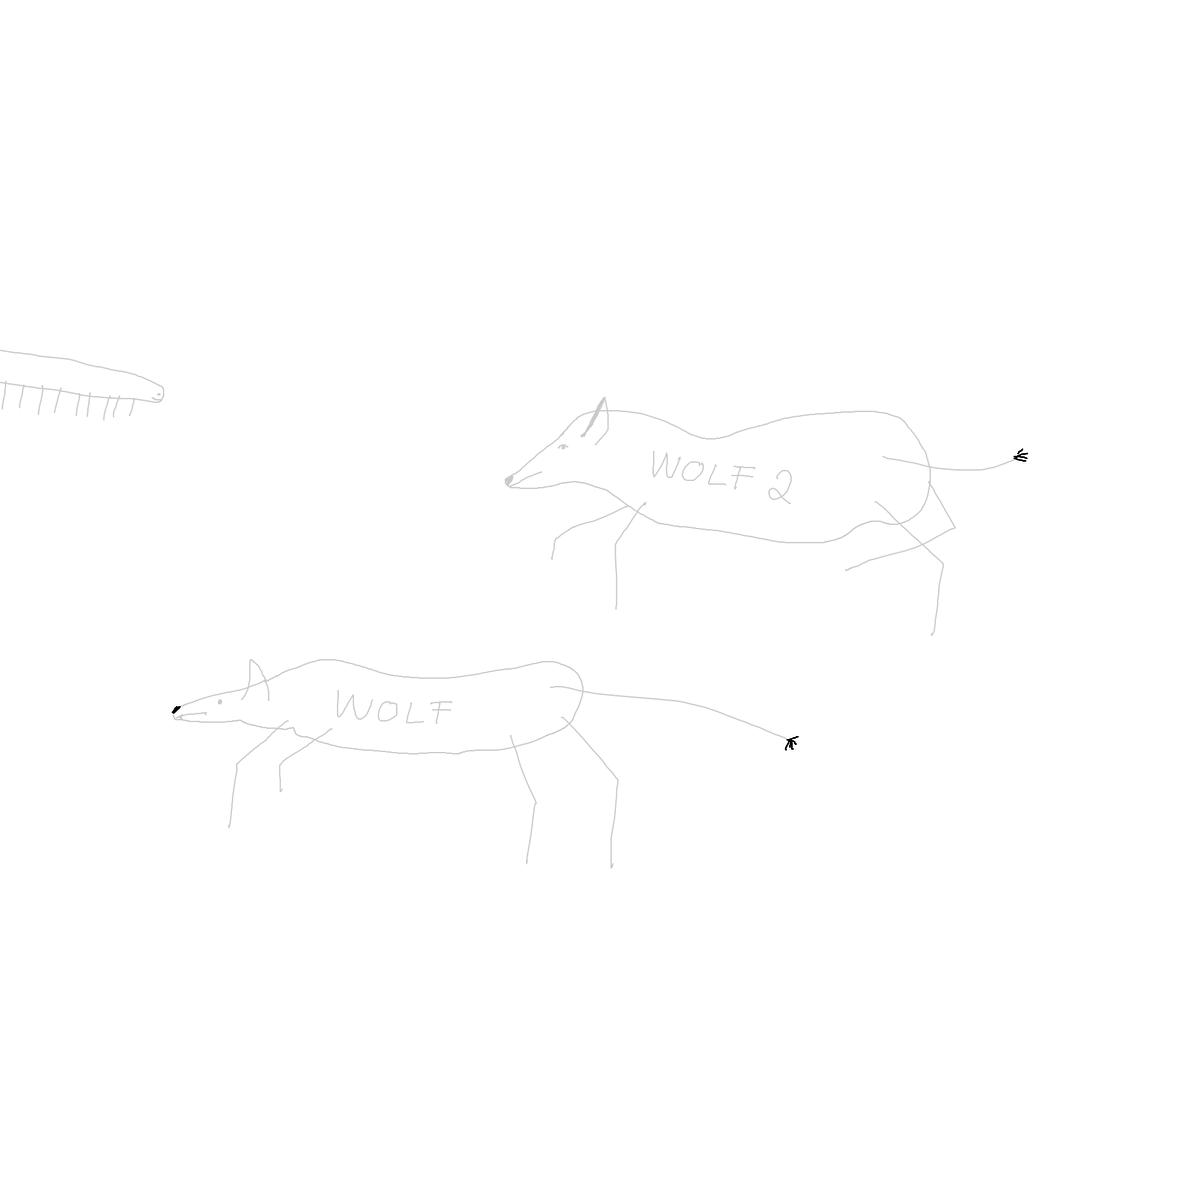 BAAAM drawing#2457 lat:52.4750061035156250lng: 13.4070167541503900